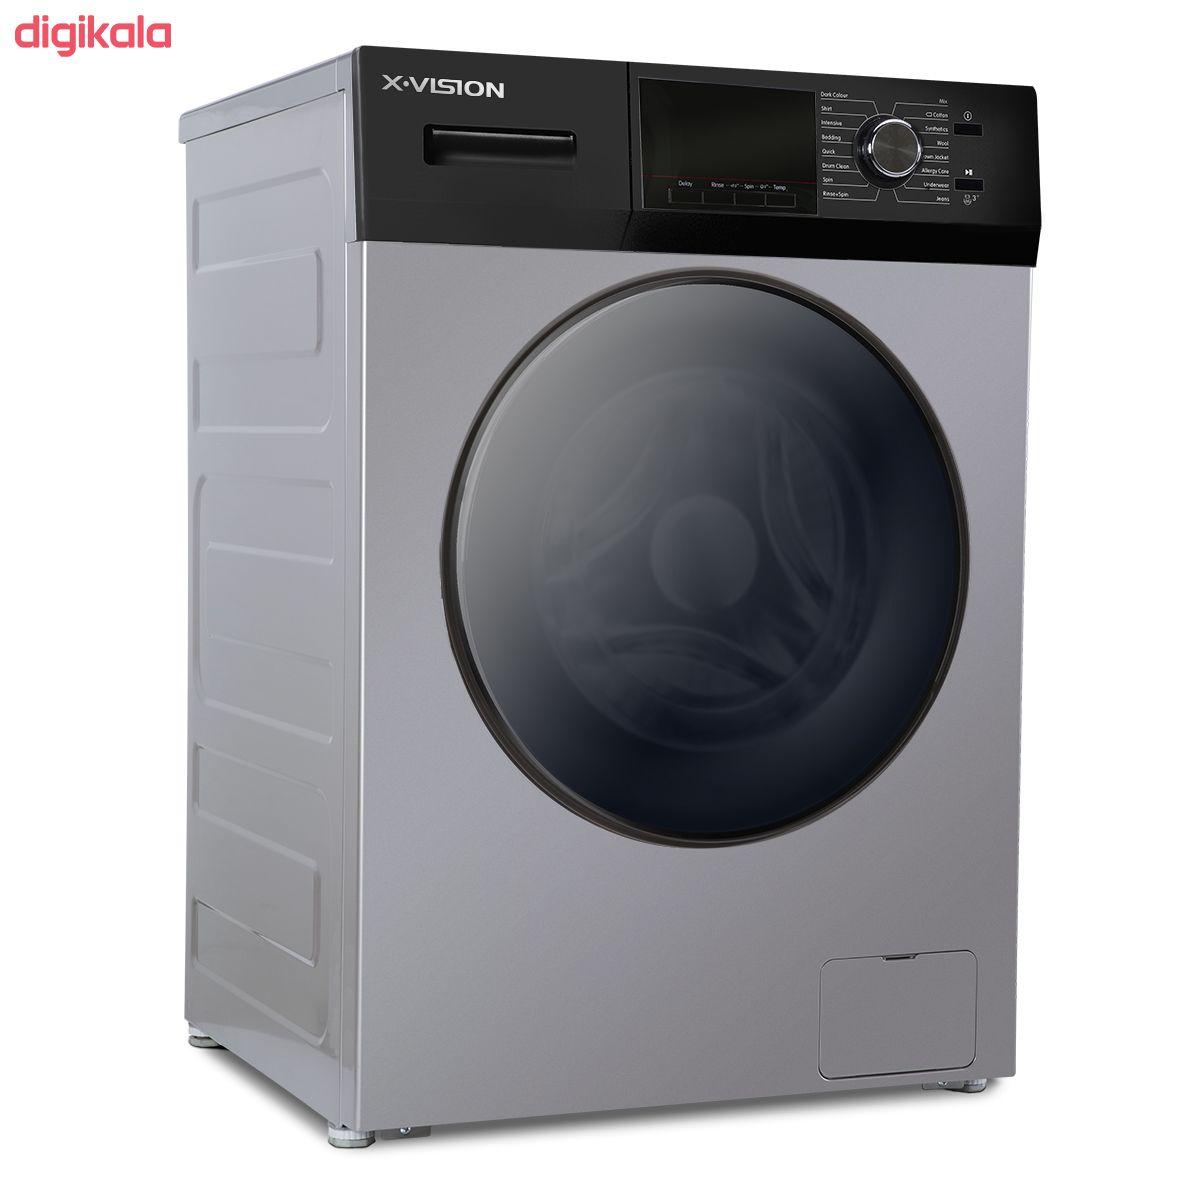 ماشین لباسشویی ایکس ویژن مدل TM84-BWBL/BSBL ظرفیت 8 کیلوگرم main 1 2